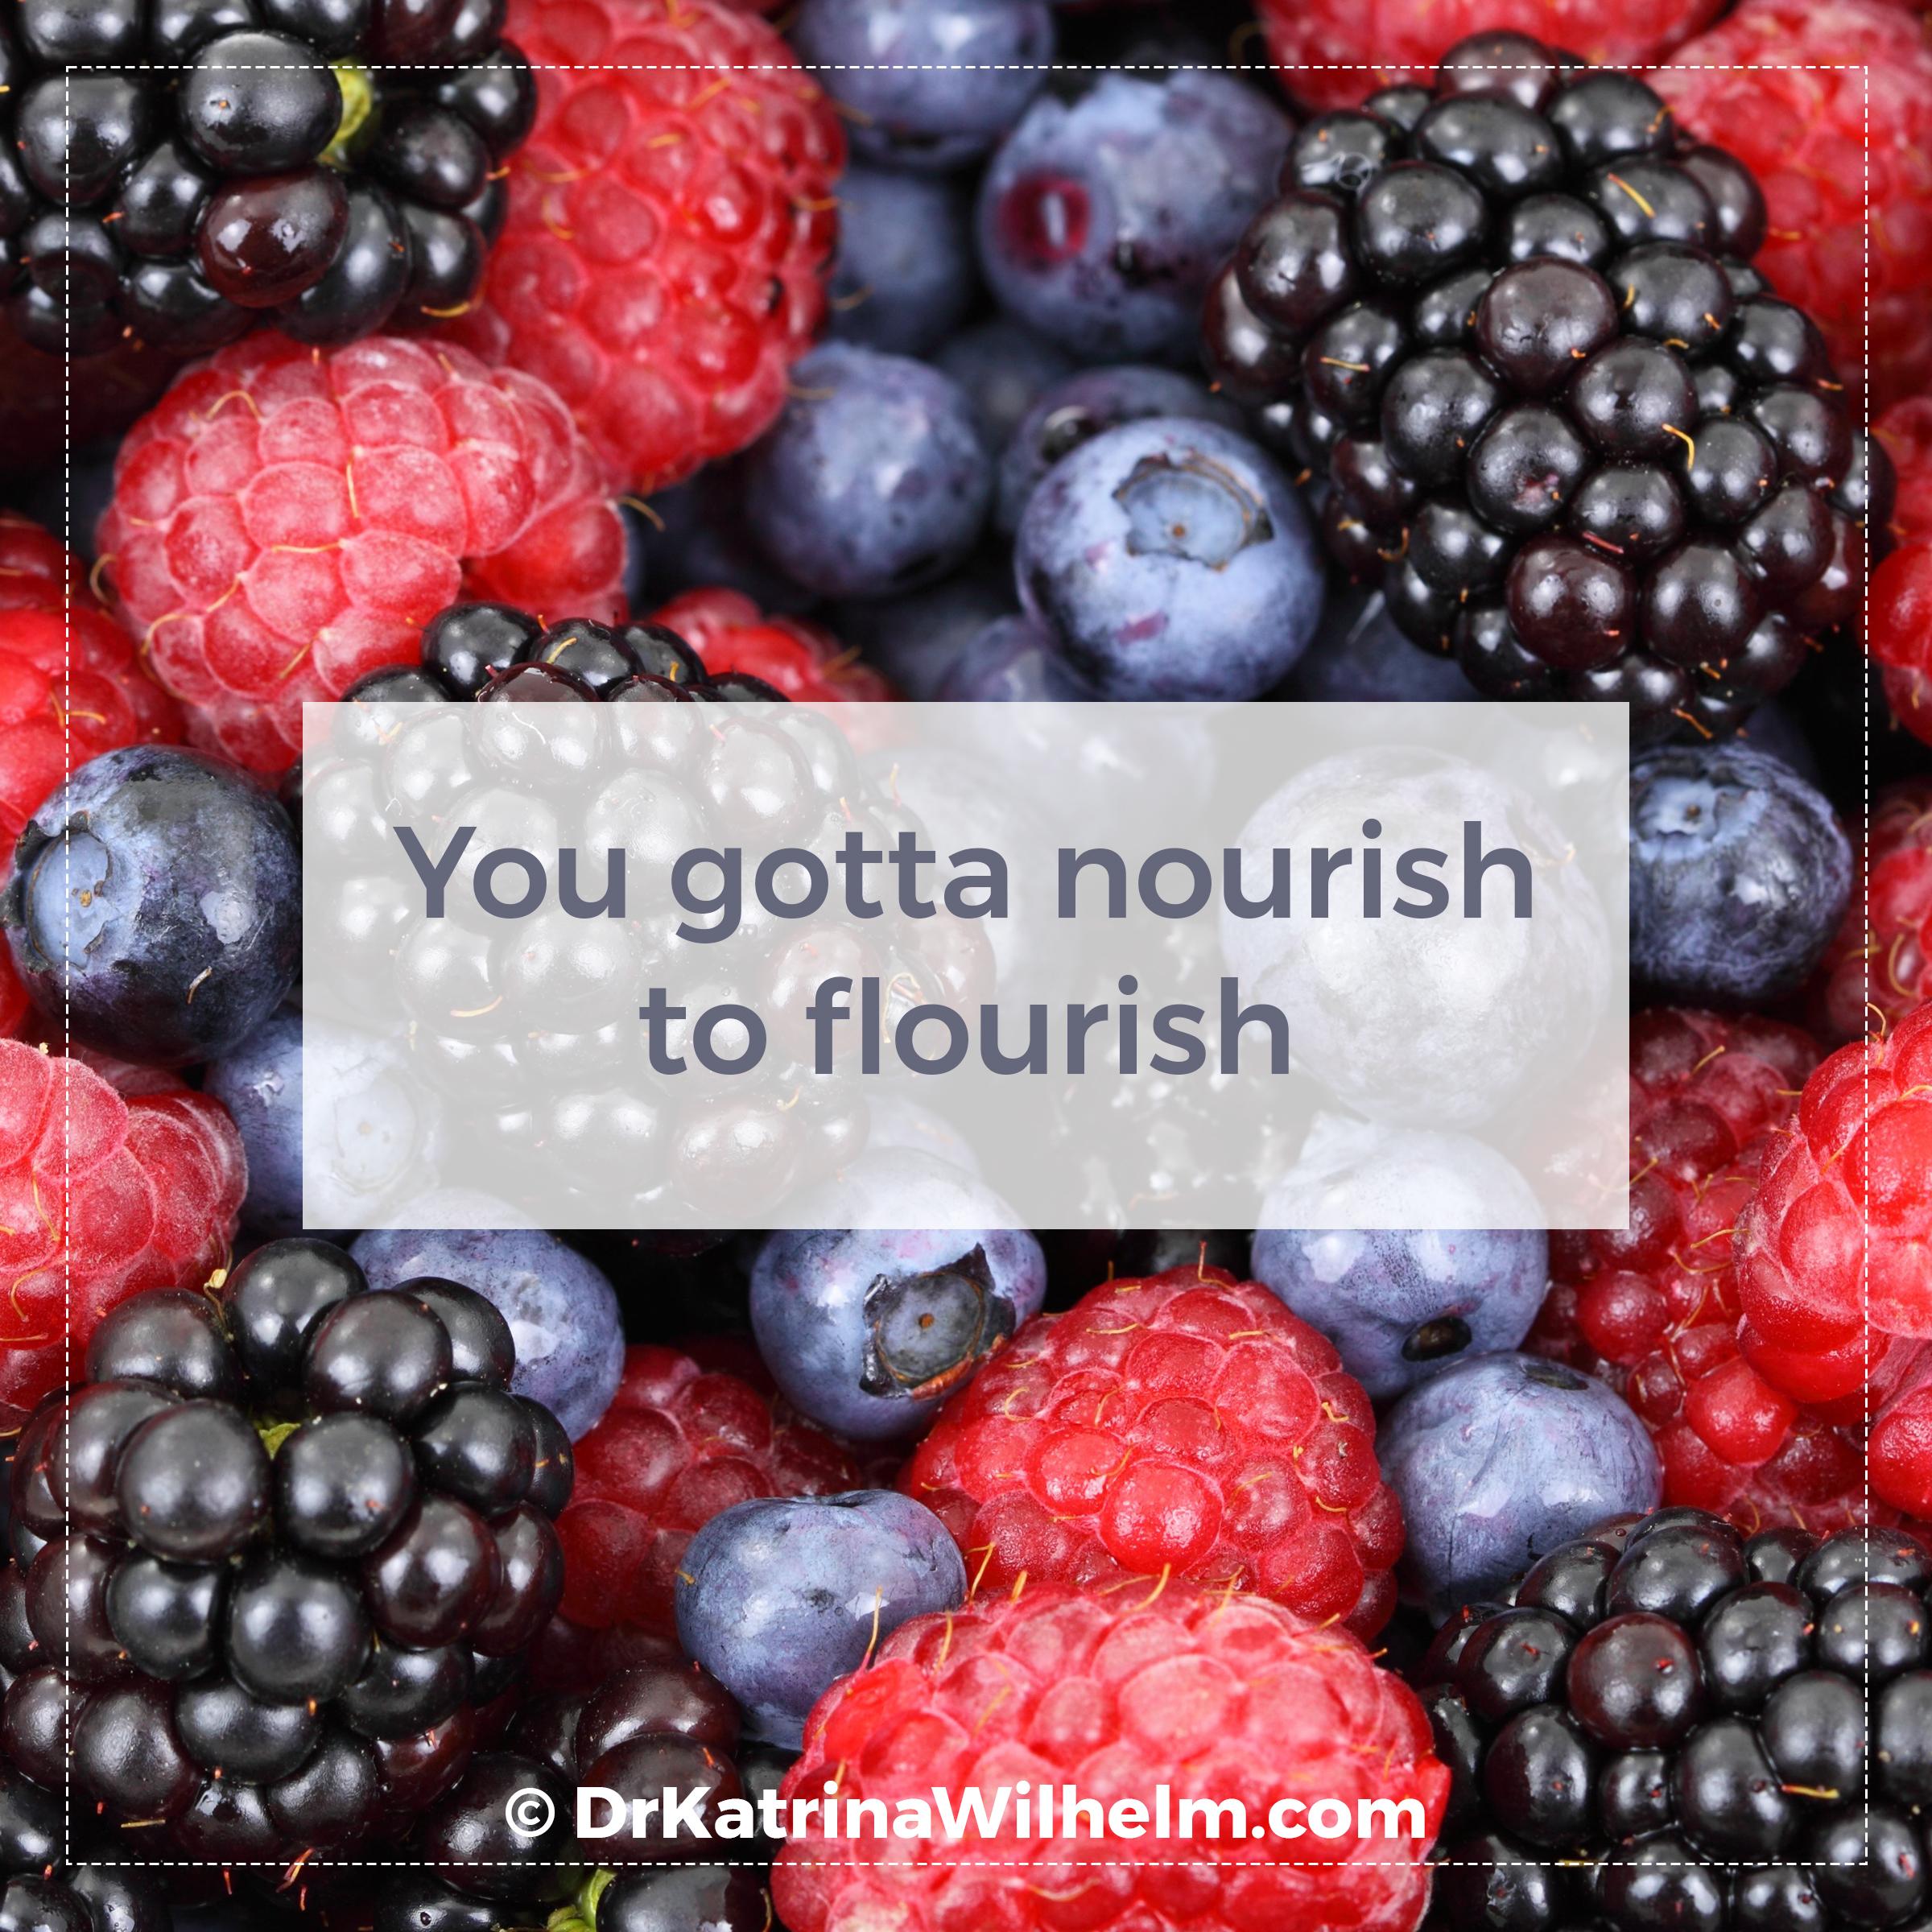 DKW healthy inspirational motivational quotes diet-27b.jpg